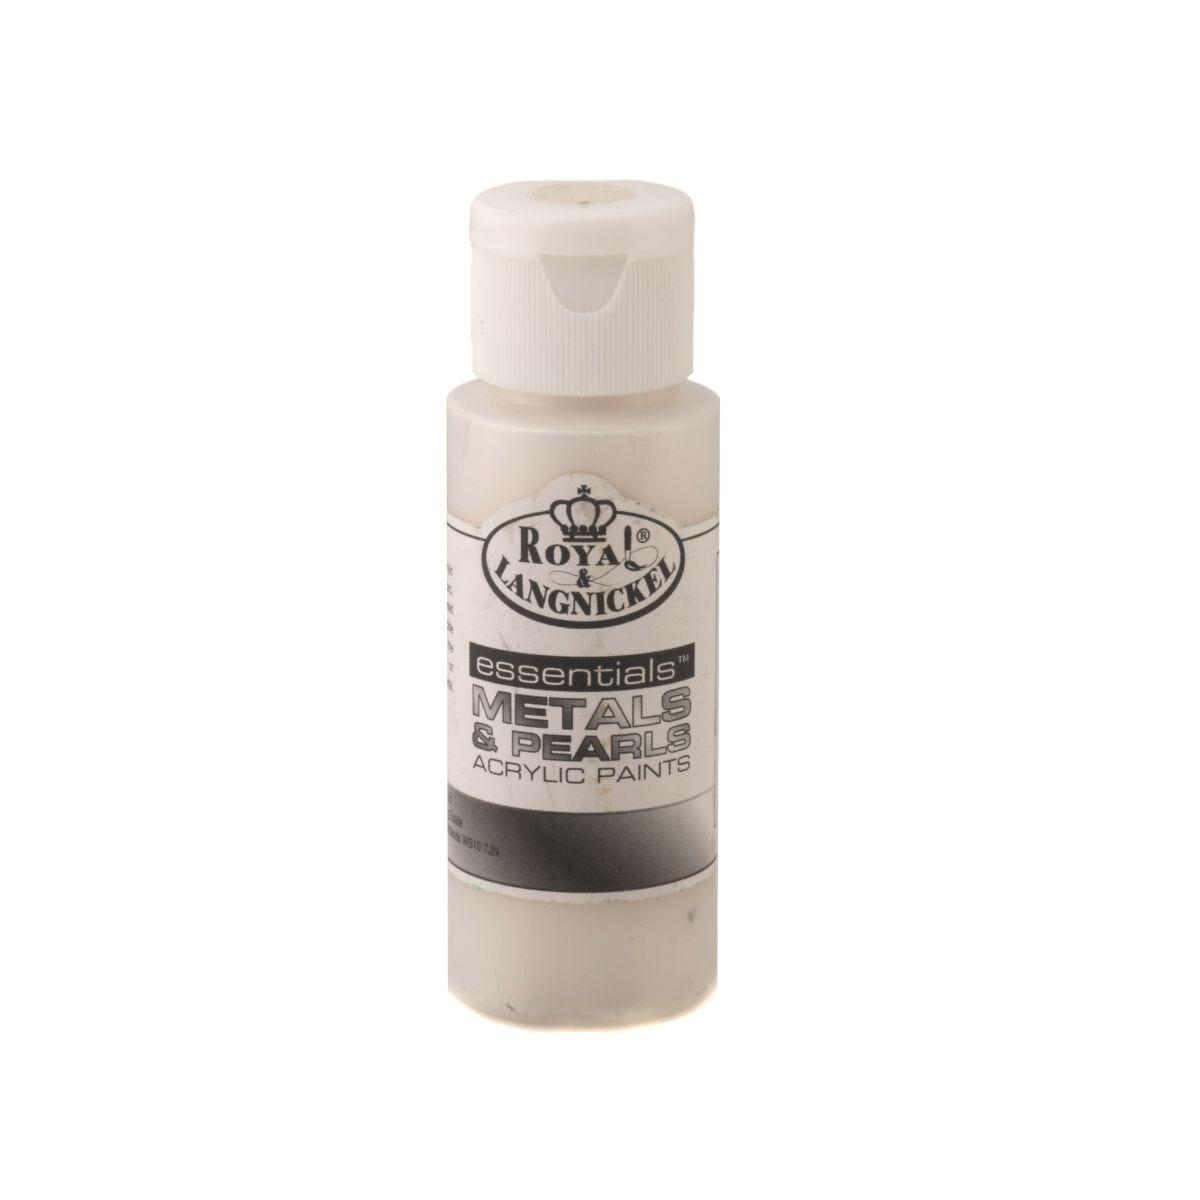 Royal & Langnickel Acrylic Paint 59ml